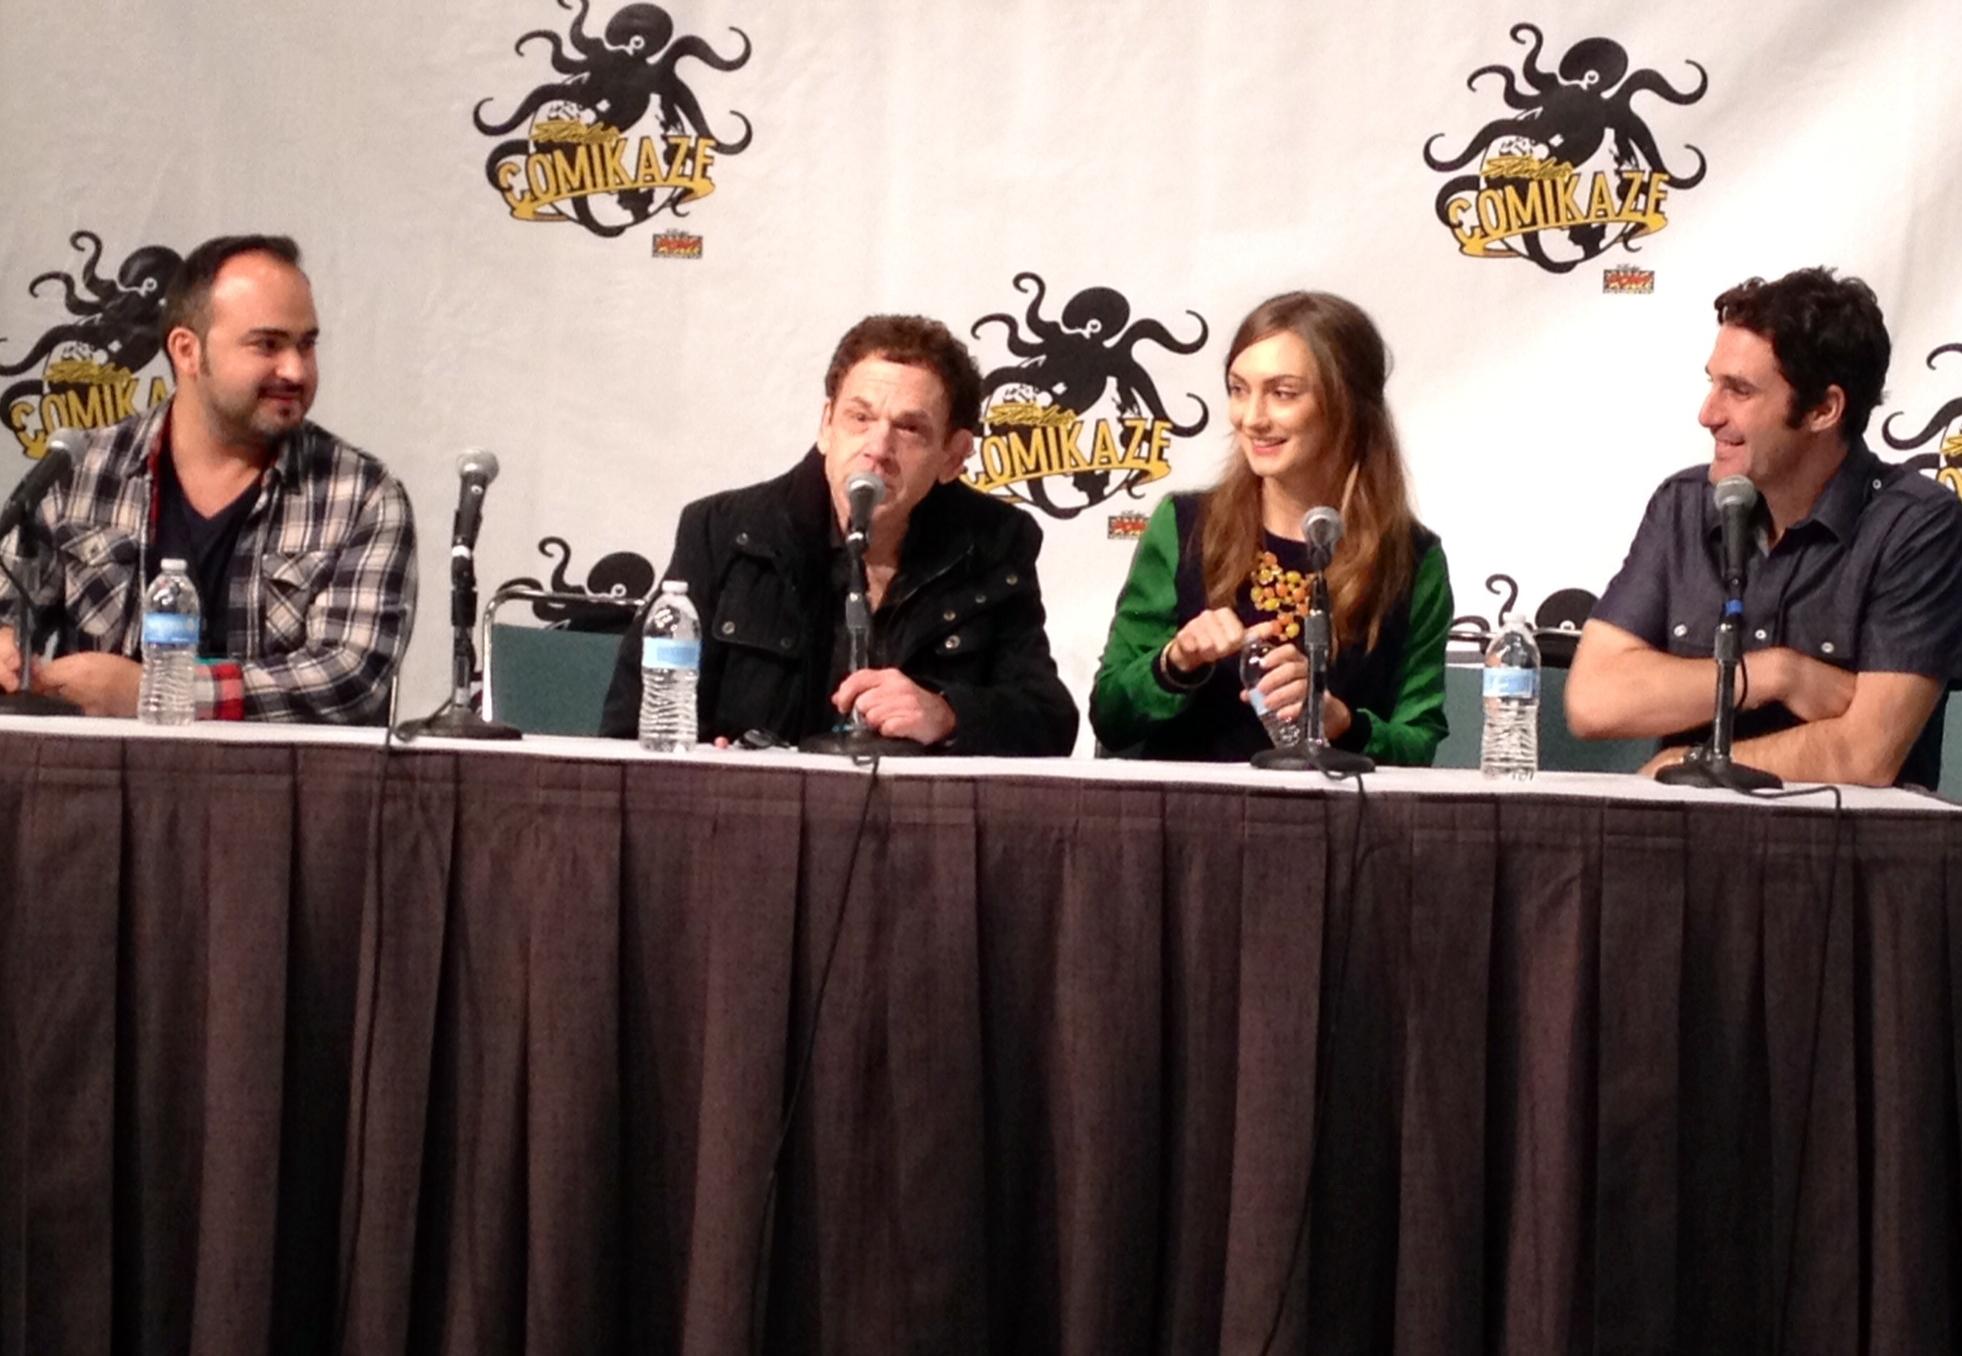 Steven Thadeus, Charles Fleischer, Hannah Levien & Josh Mann at Comikaze 2013